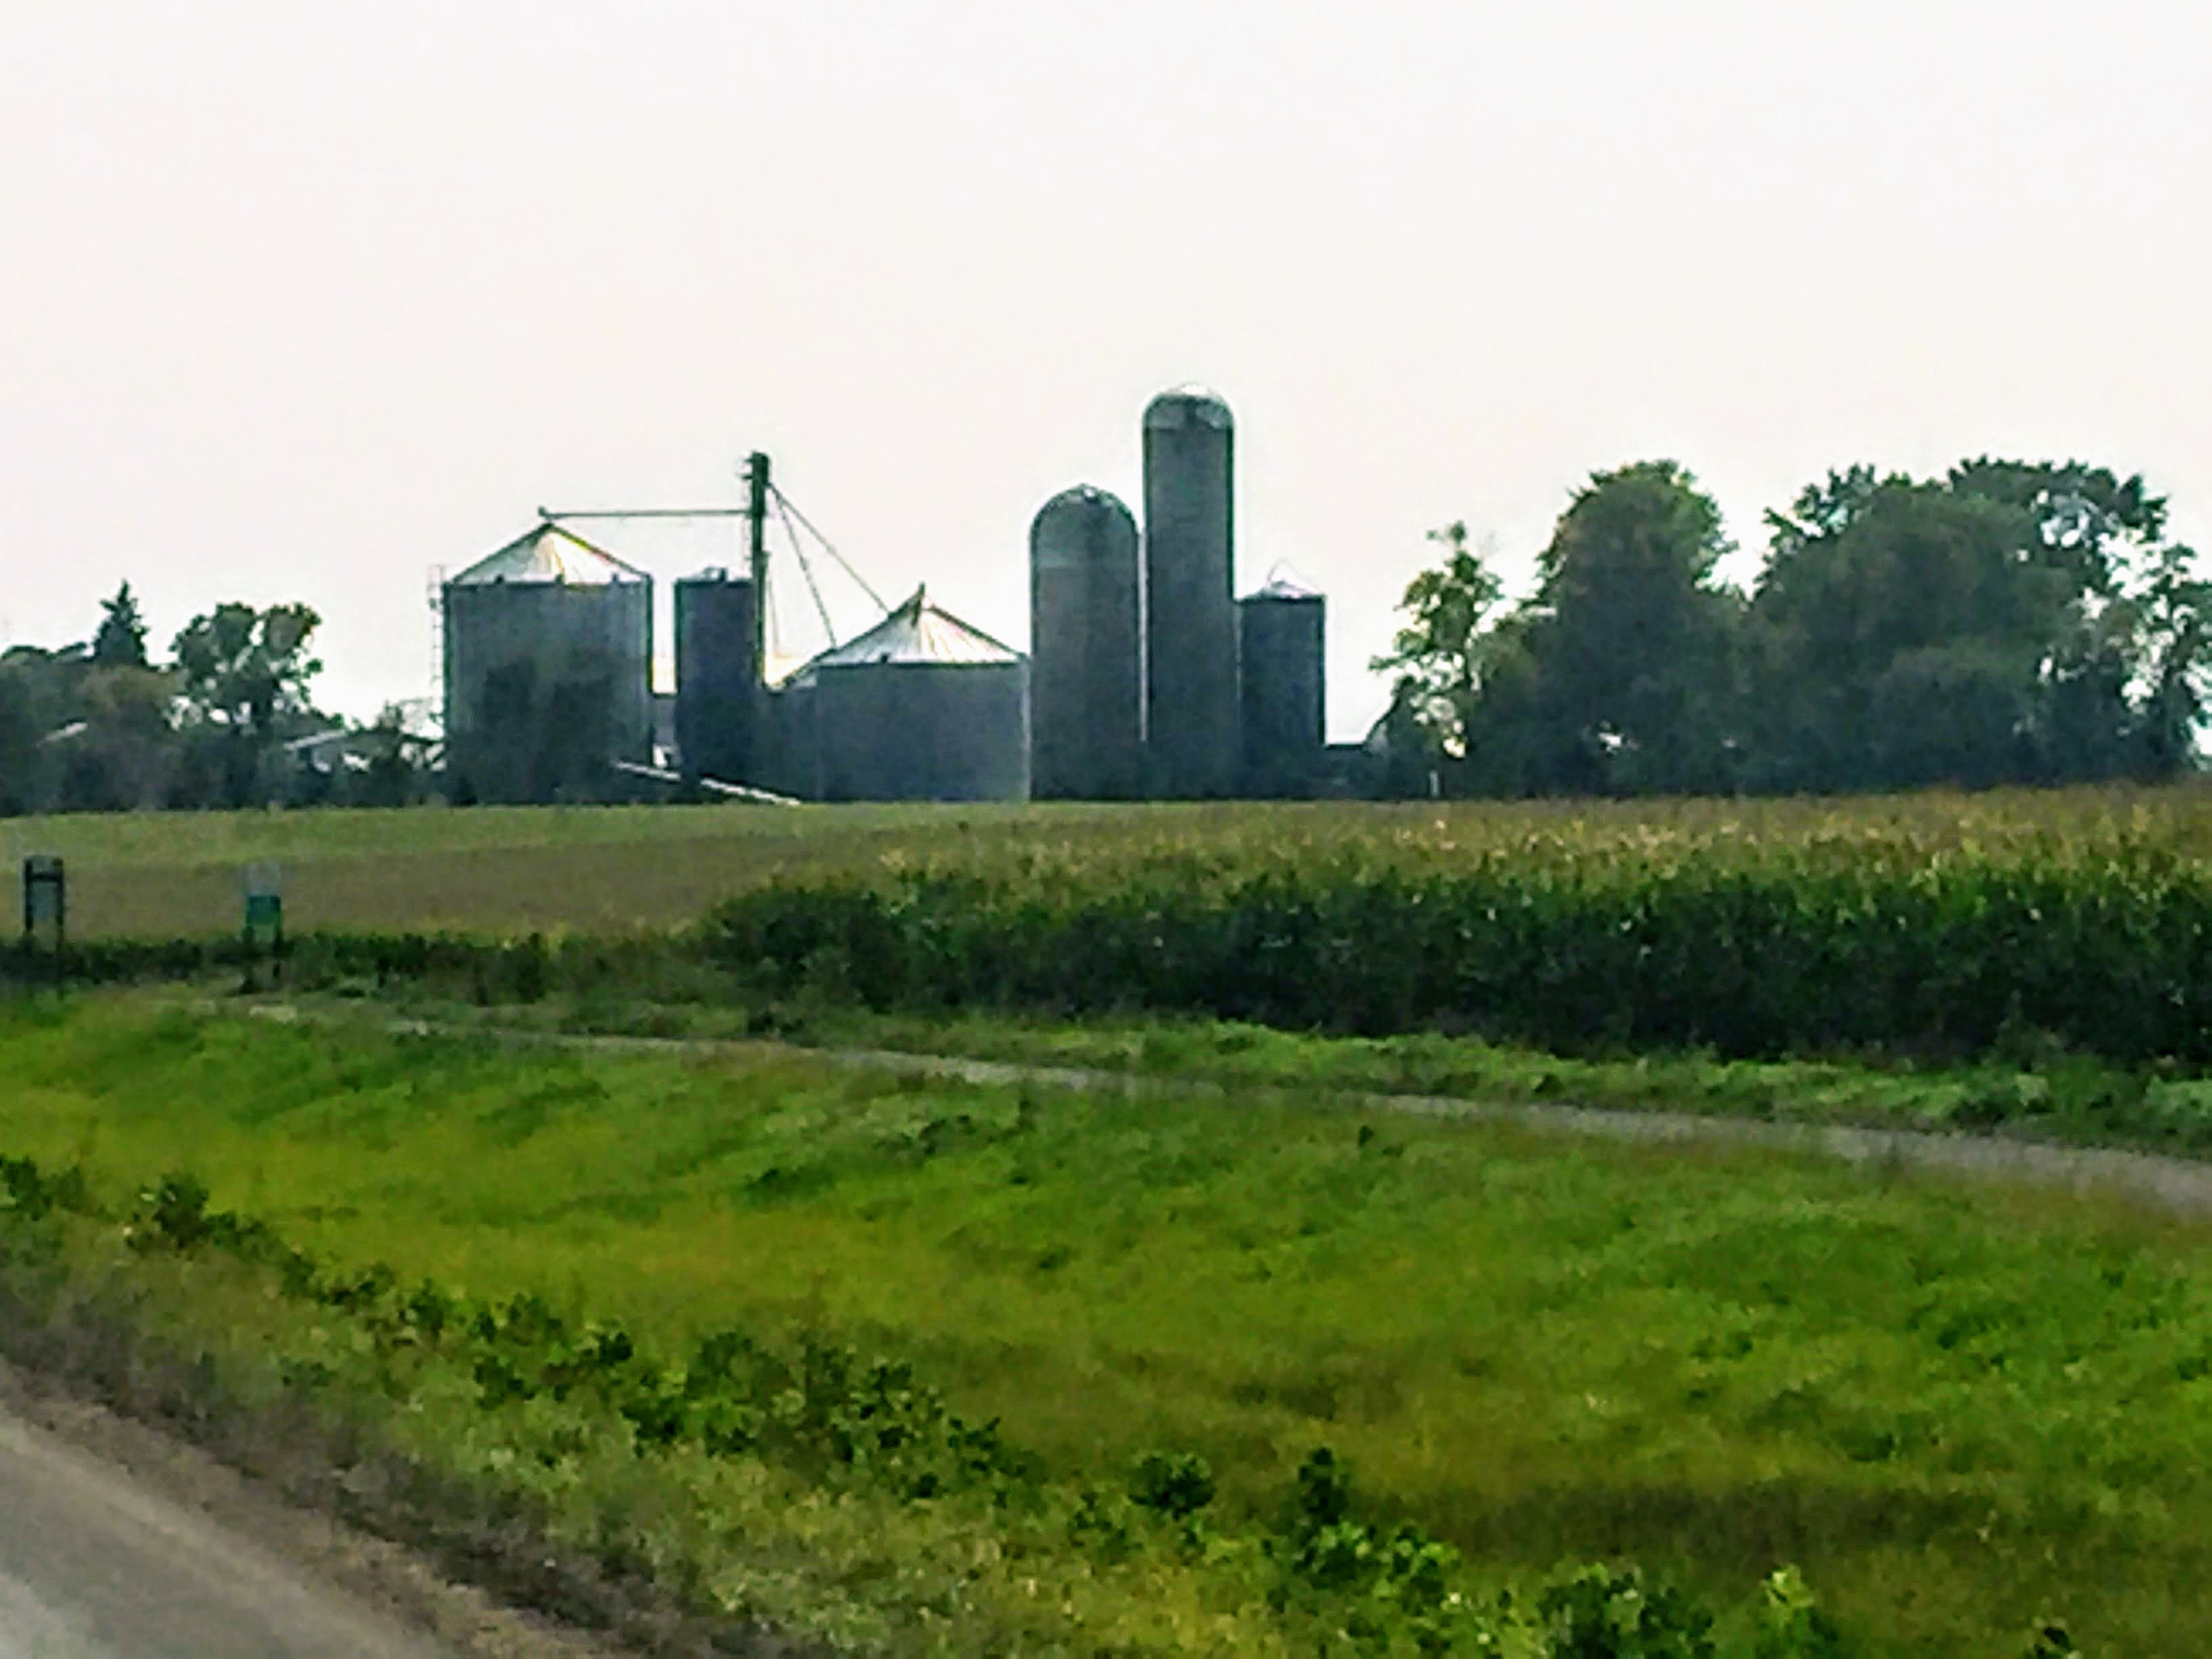 2017-09-13 Minnesota Farms 03